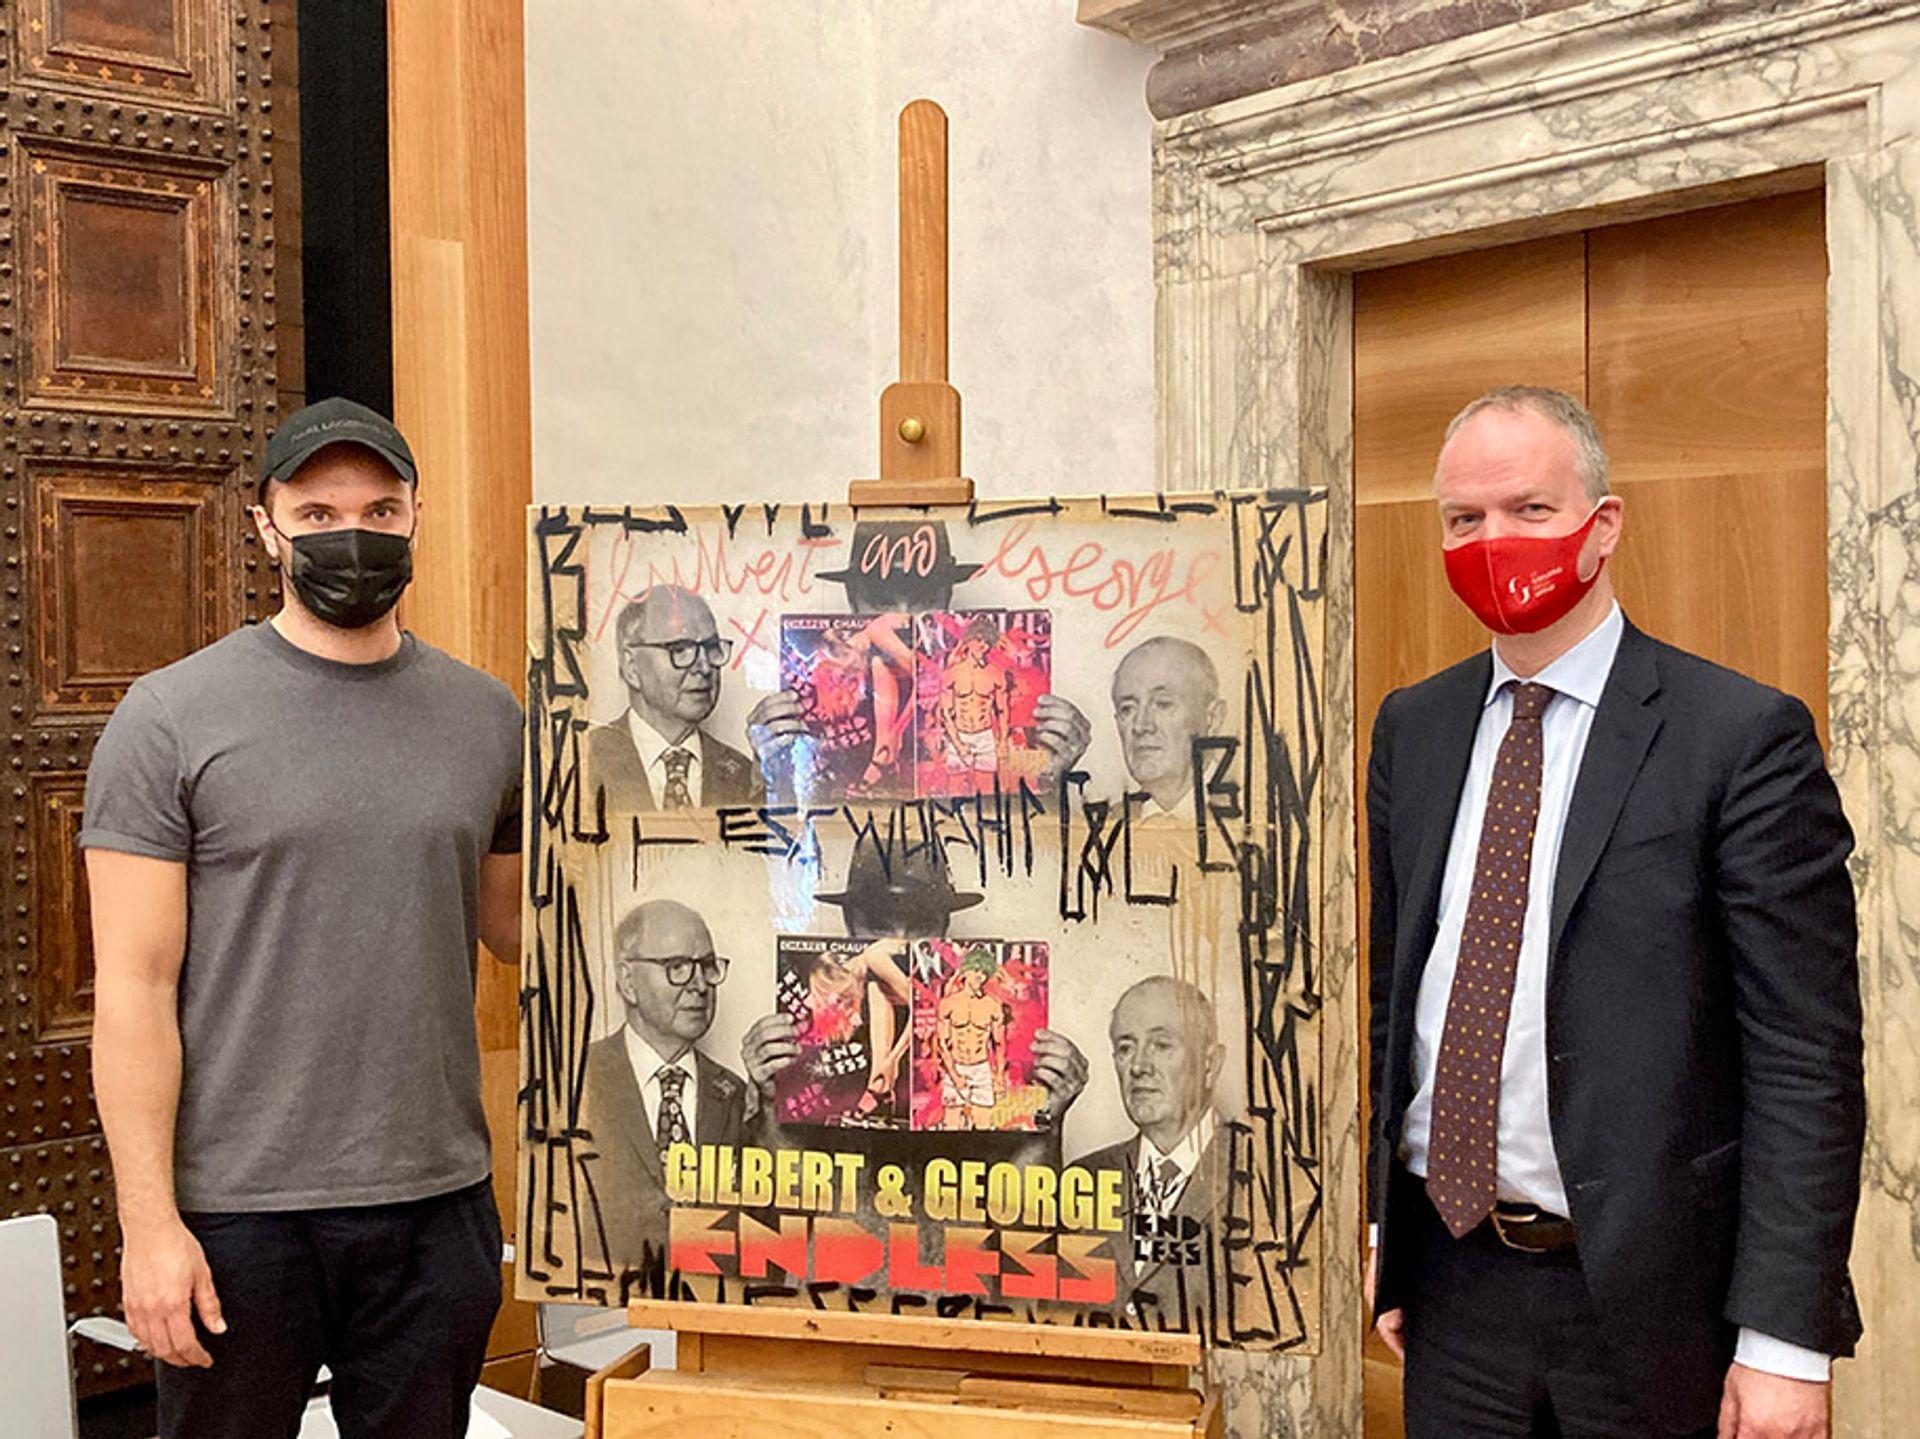 Uffizi director Eike Schmidt (left) with Endless Courtesy of Uffizi Galleries